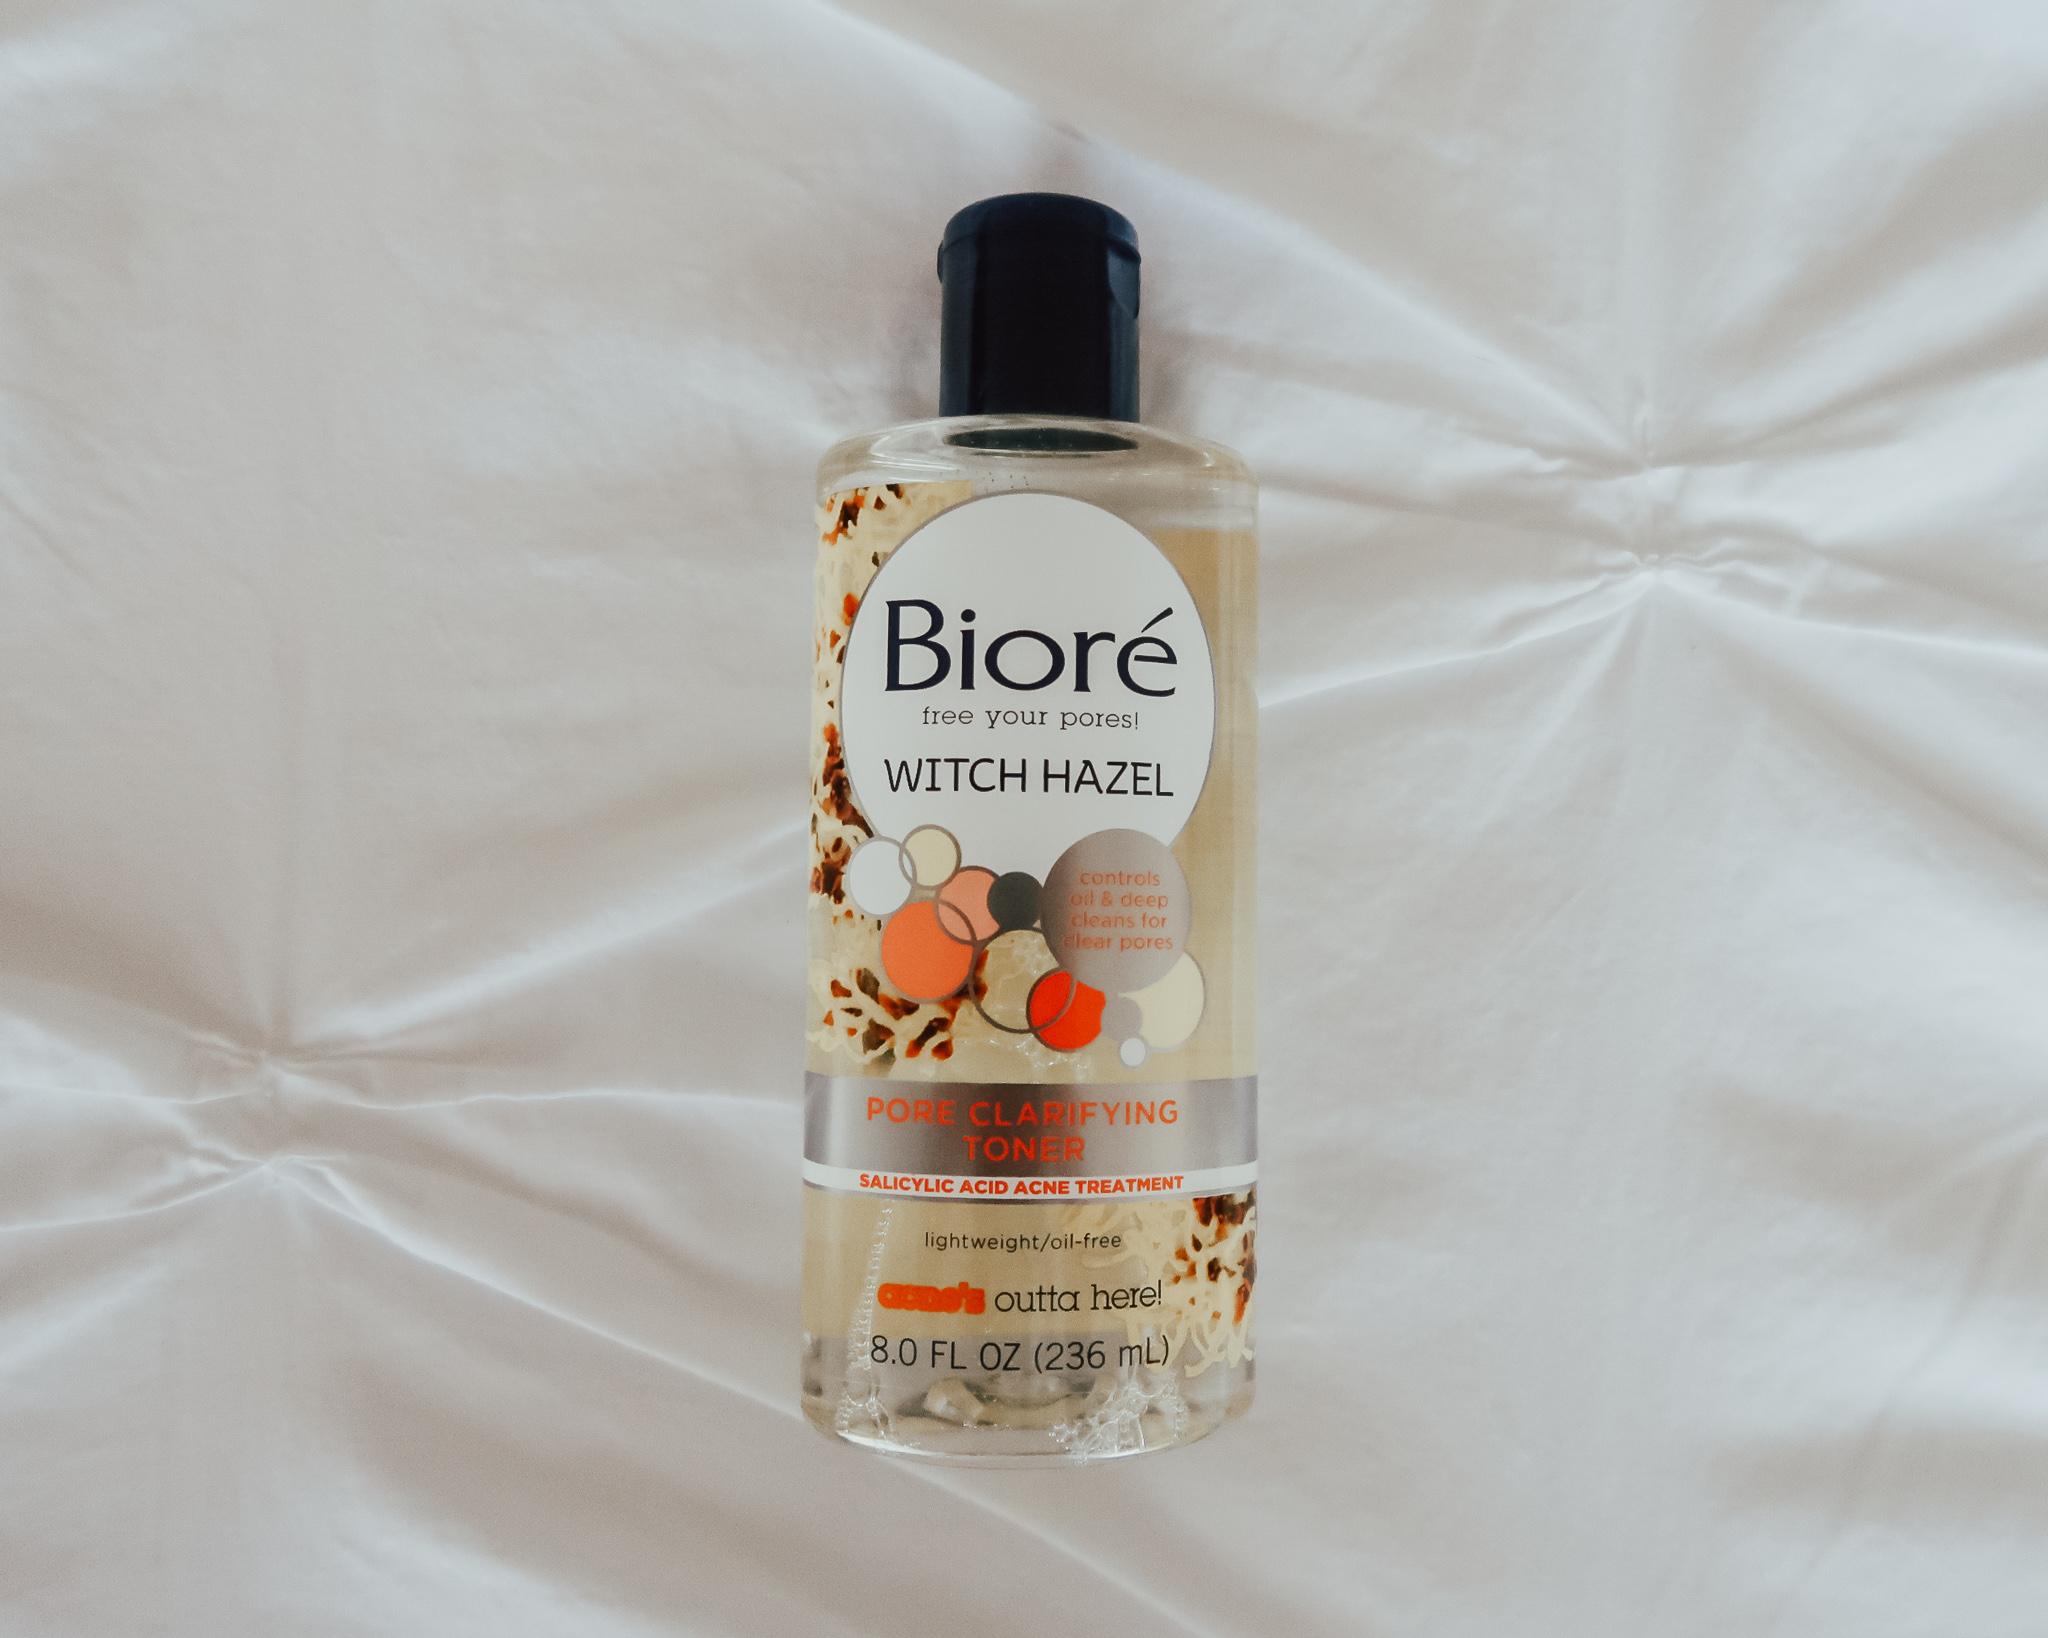 Biore-Witch-Hazel-Pore-Strips-Toner-Skincare-Regime-3.jpg